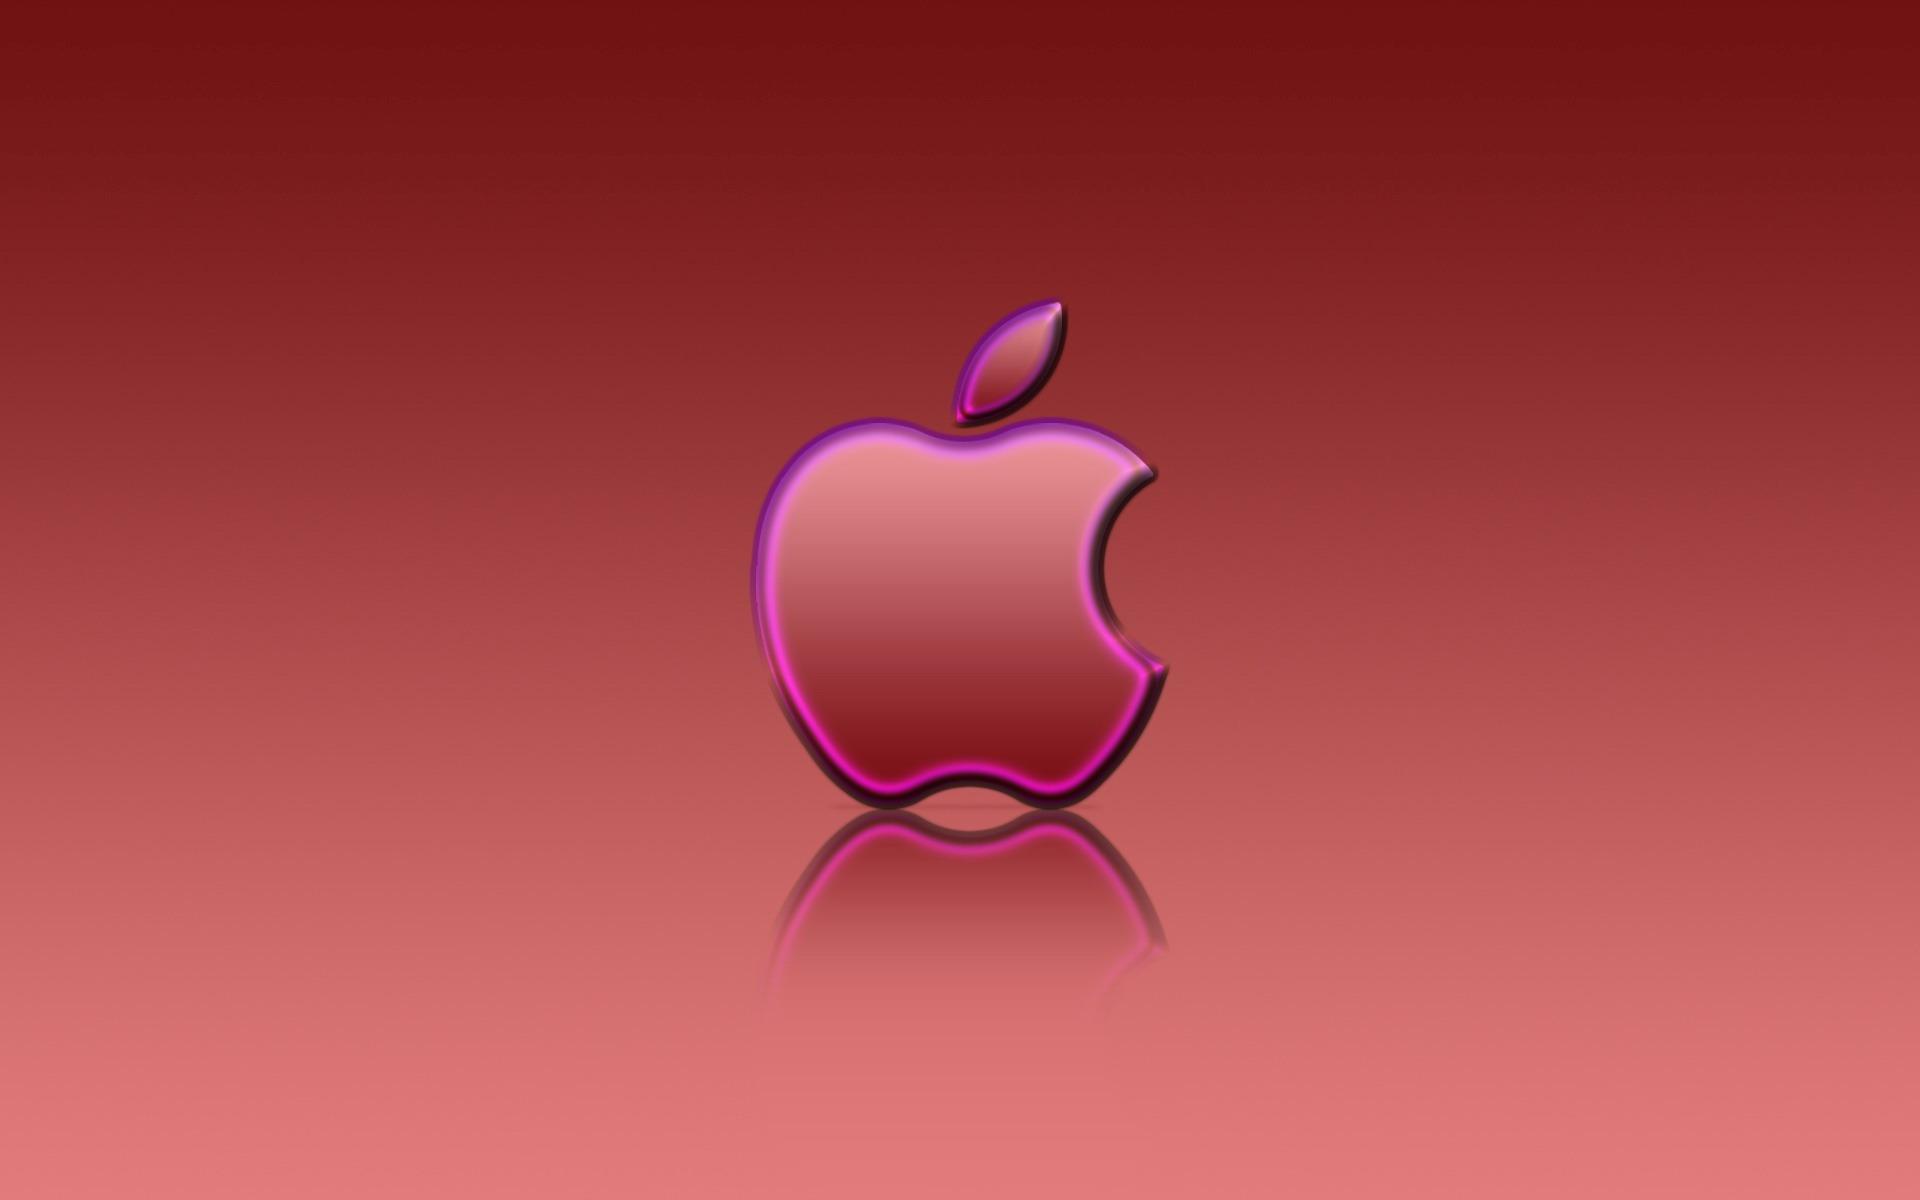 Cool Wallpaper Macbook Purple - apple_red_reflexion_wallpaper_apple_computers_2759  HD_952957.jpg